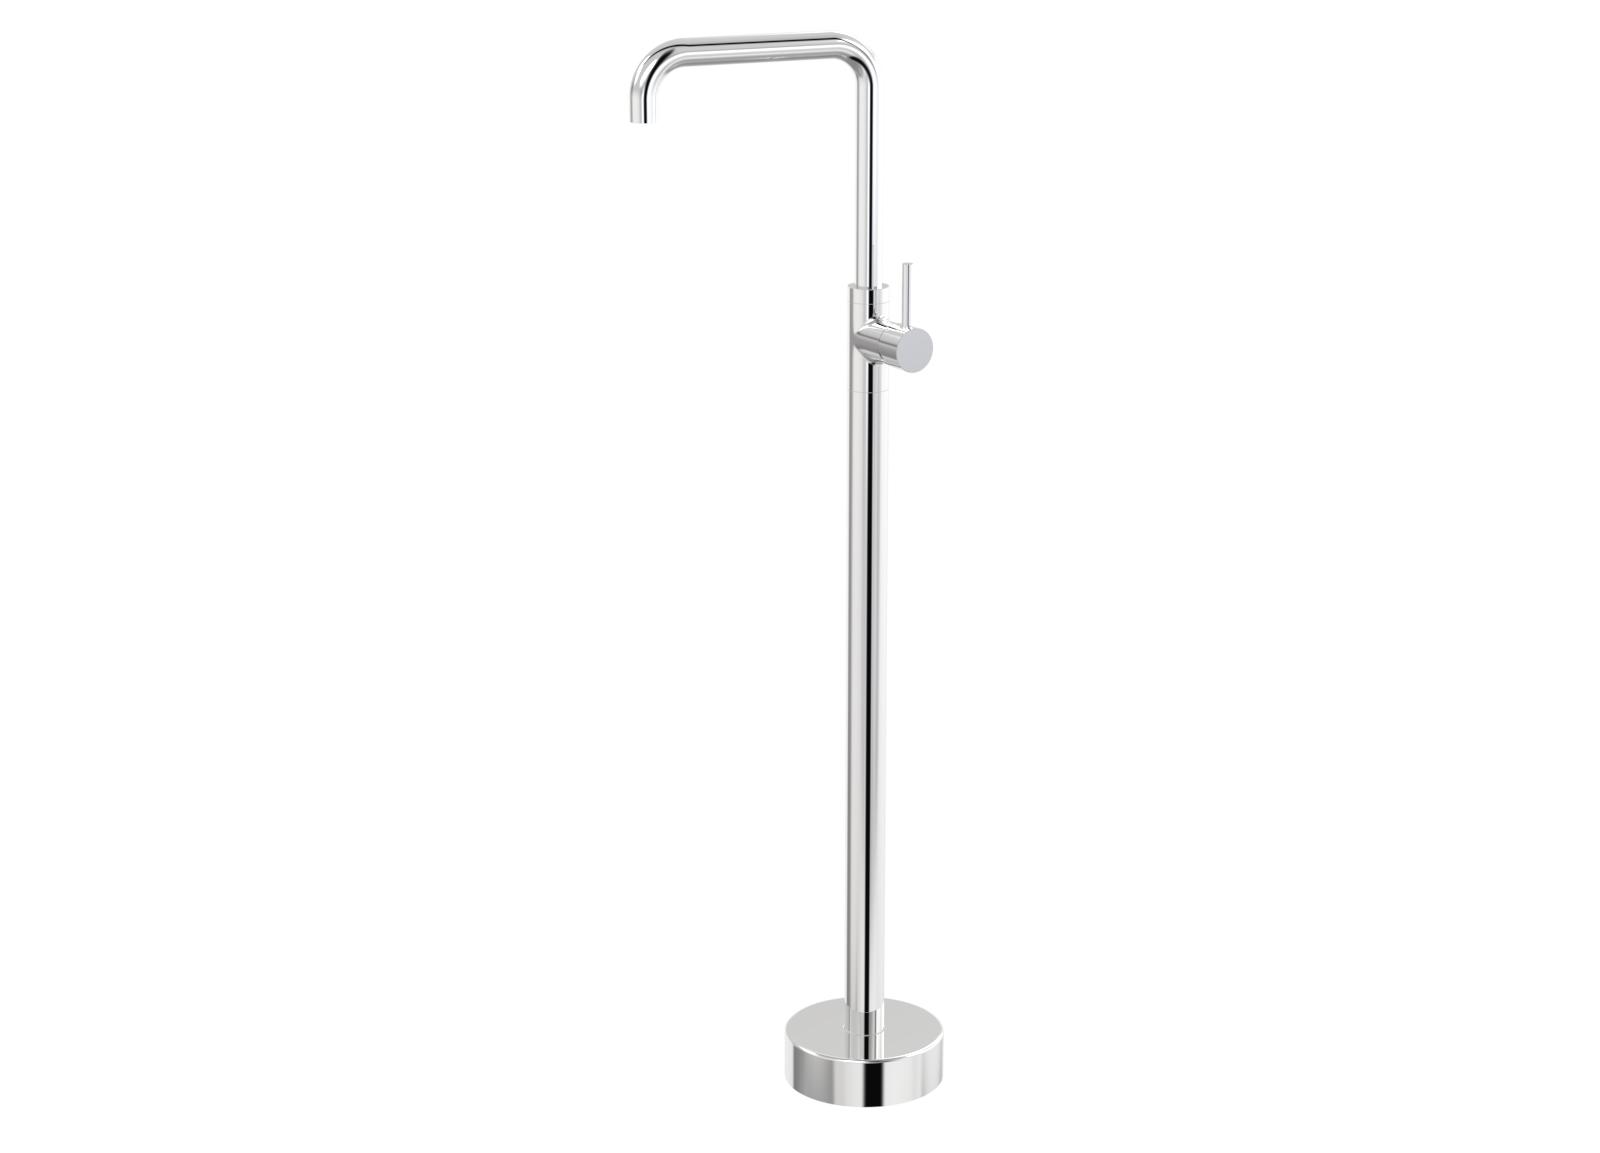 Par Taps Lugano Floor Bath Filler 90 Degree Mixer